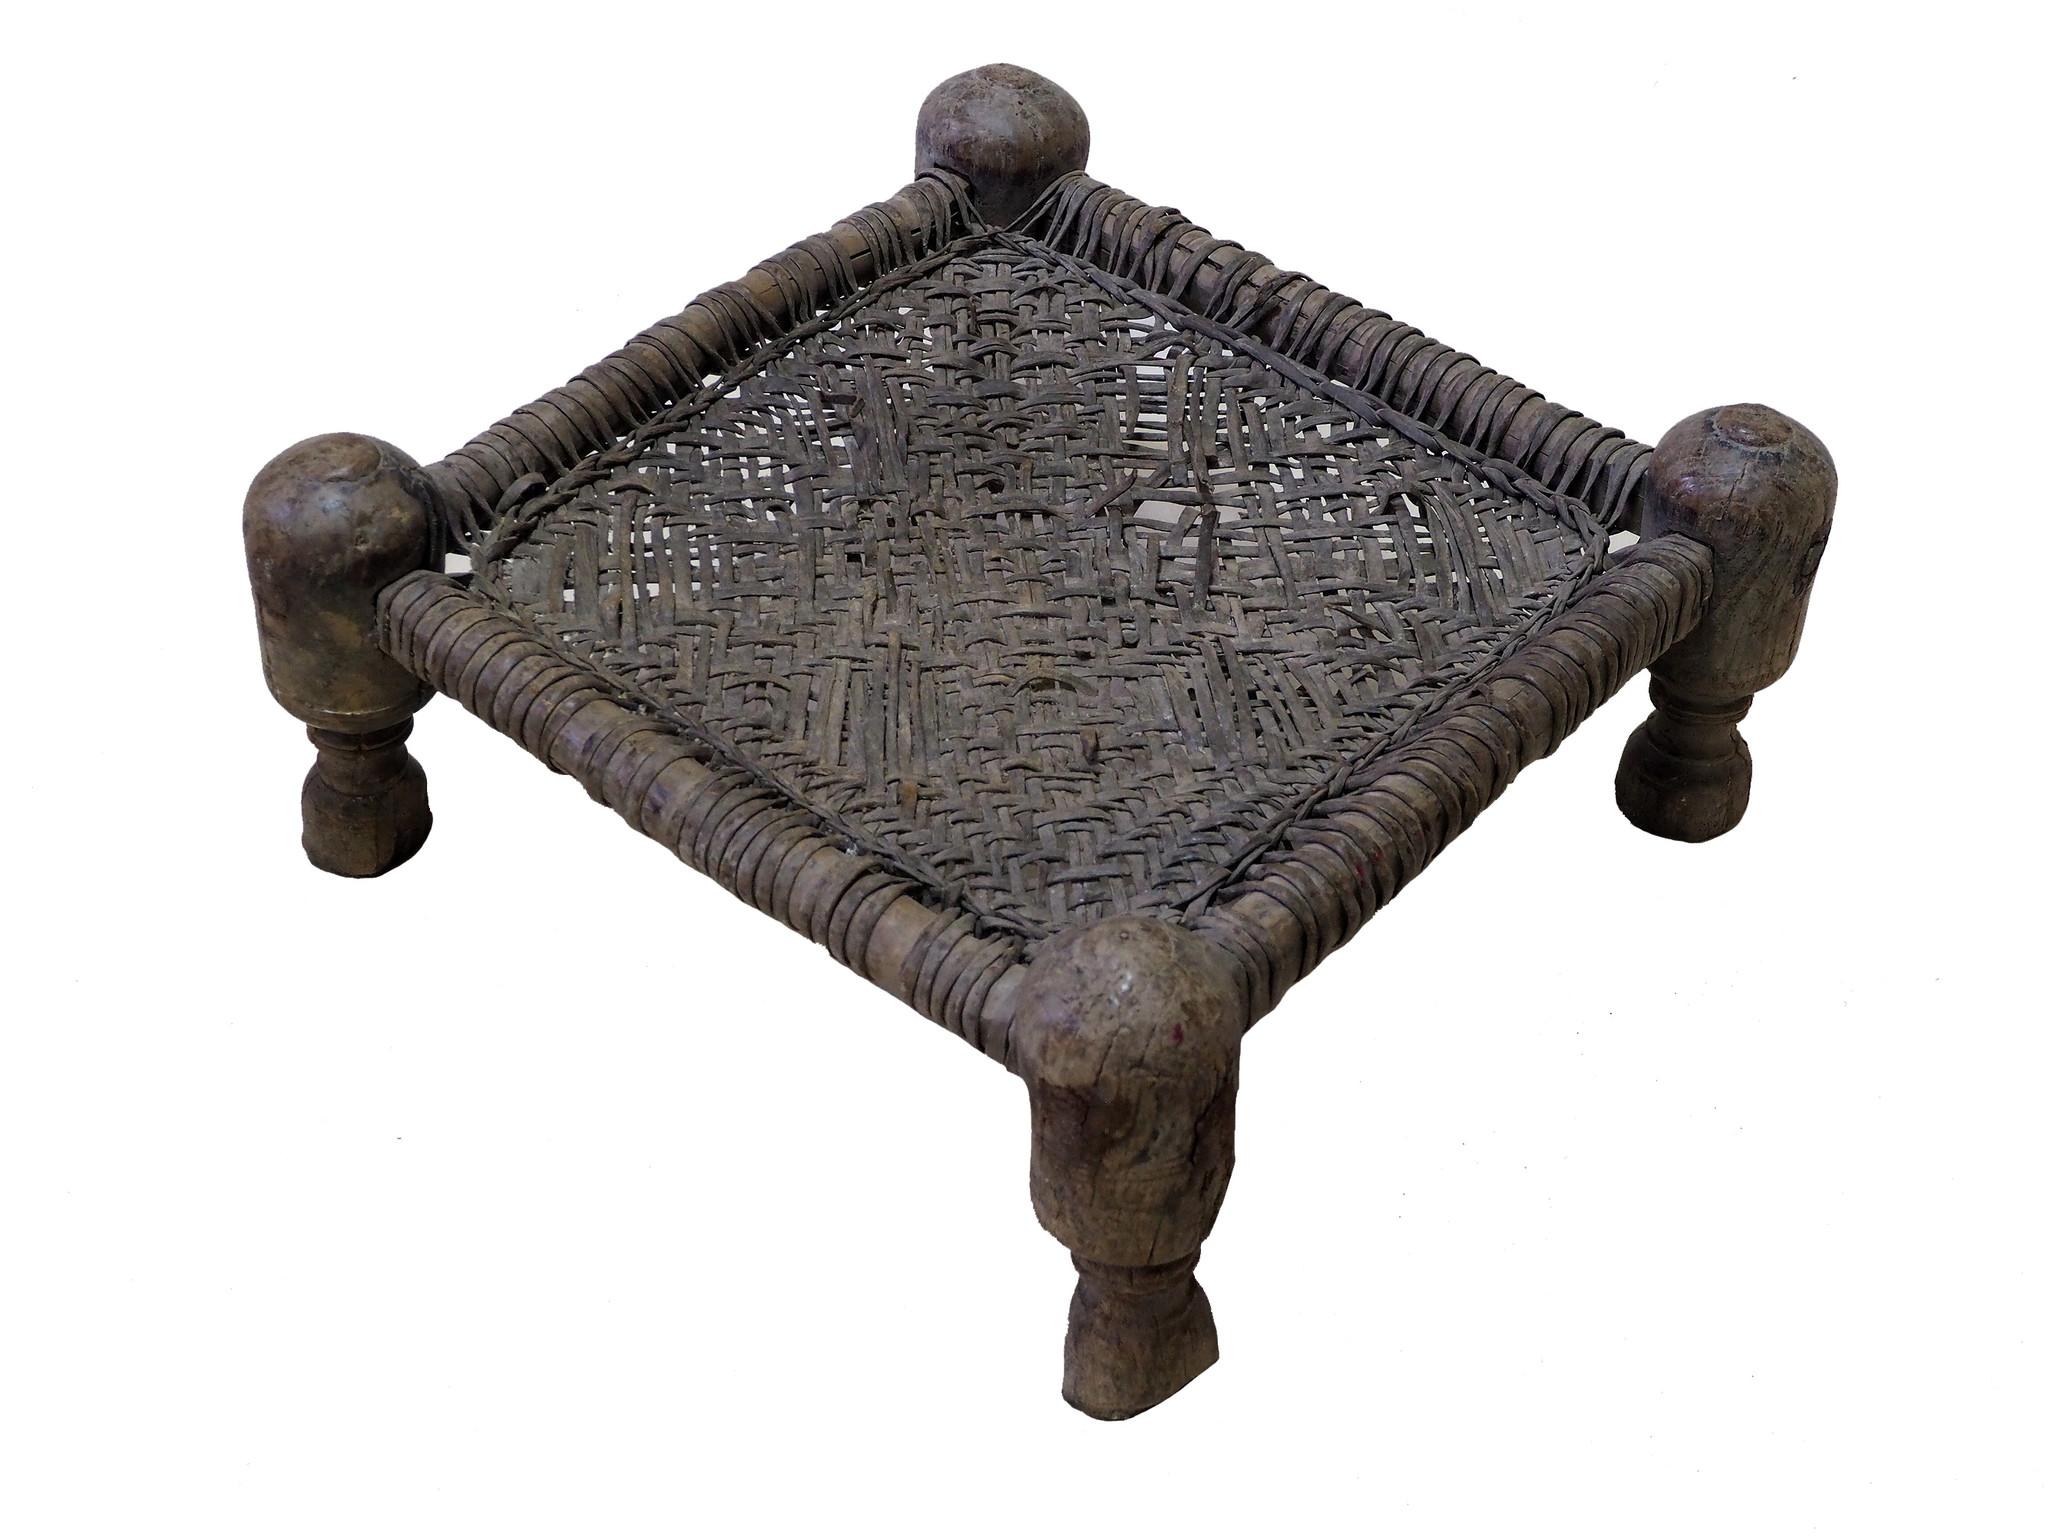 42x42 cmAntique Nuristan Chair  stool  No:NUR21-C